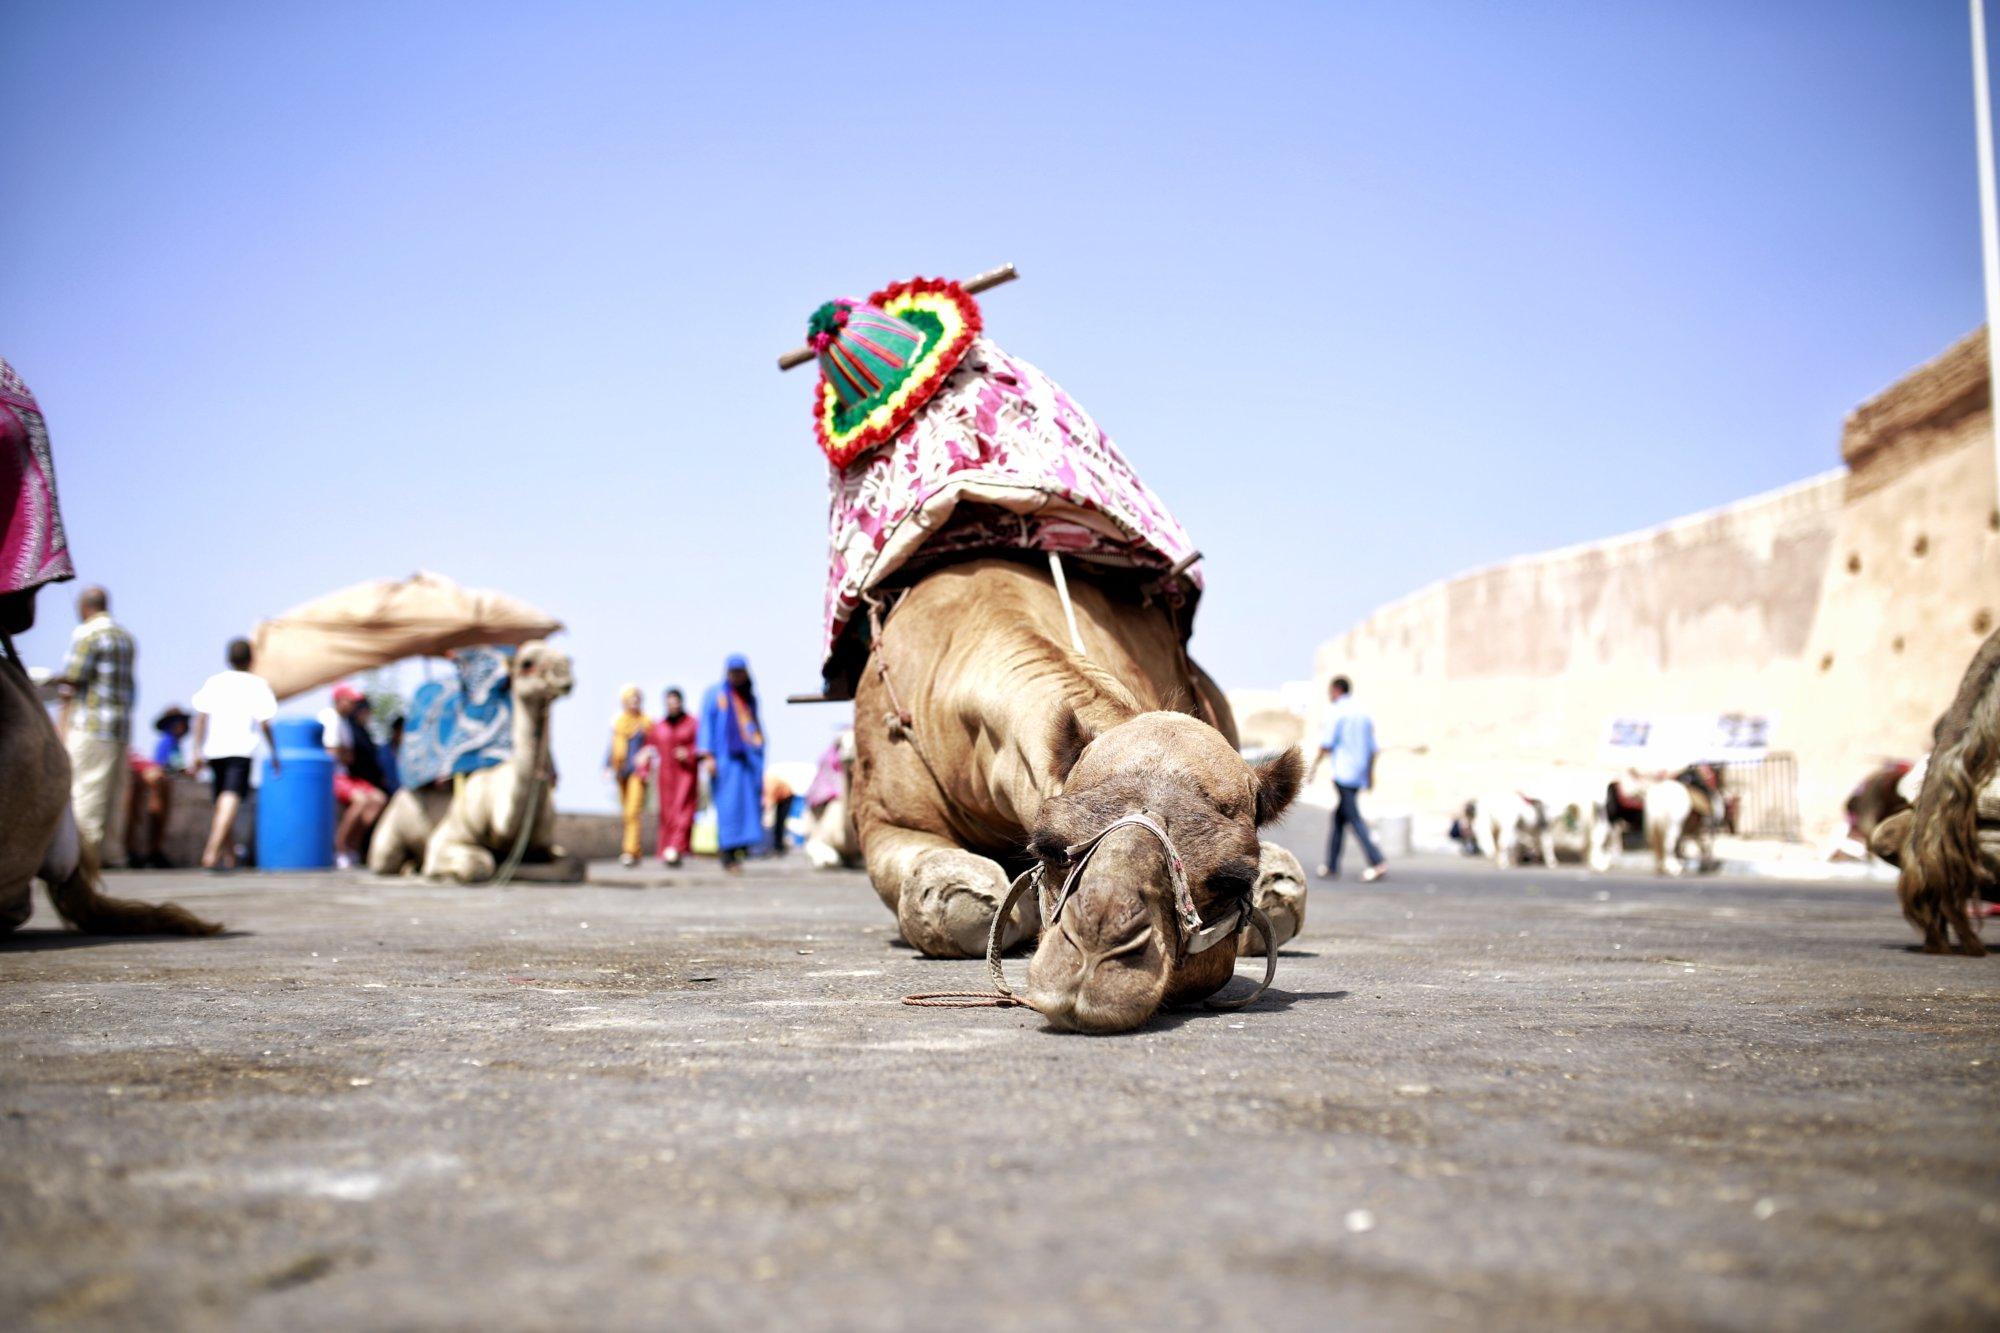 tired-camel-having-a-break-agadir-marokko-kasuma-photo-blog-2016